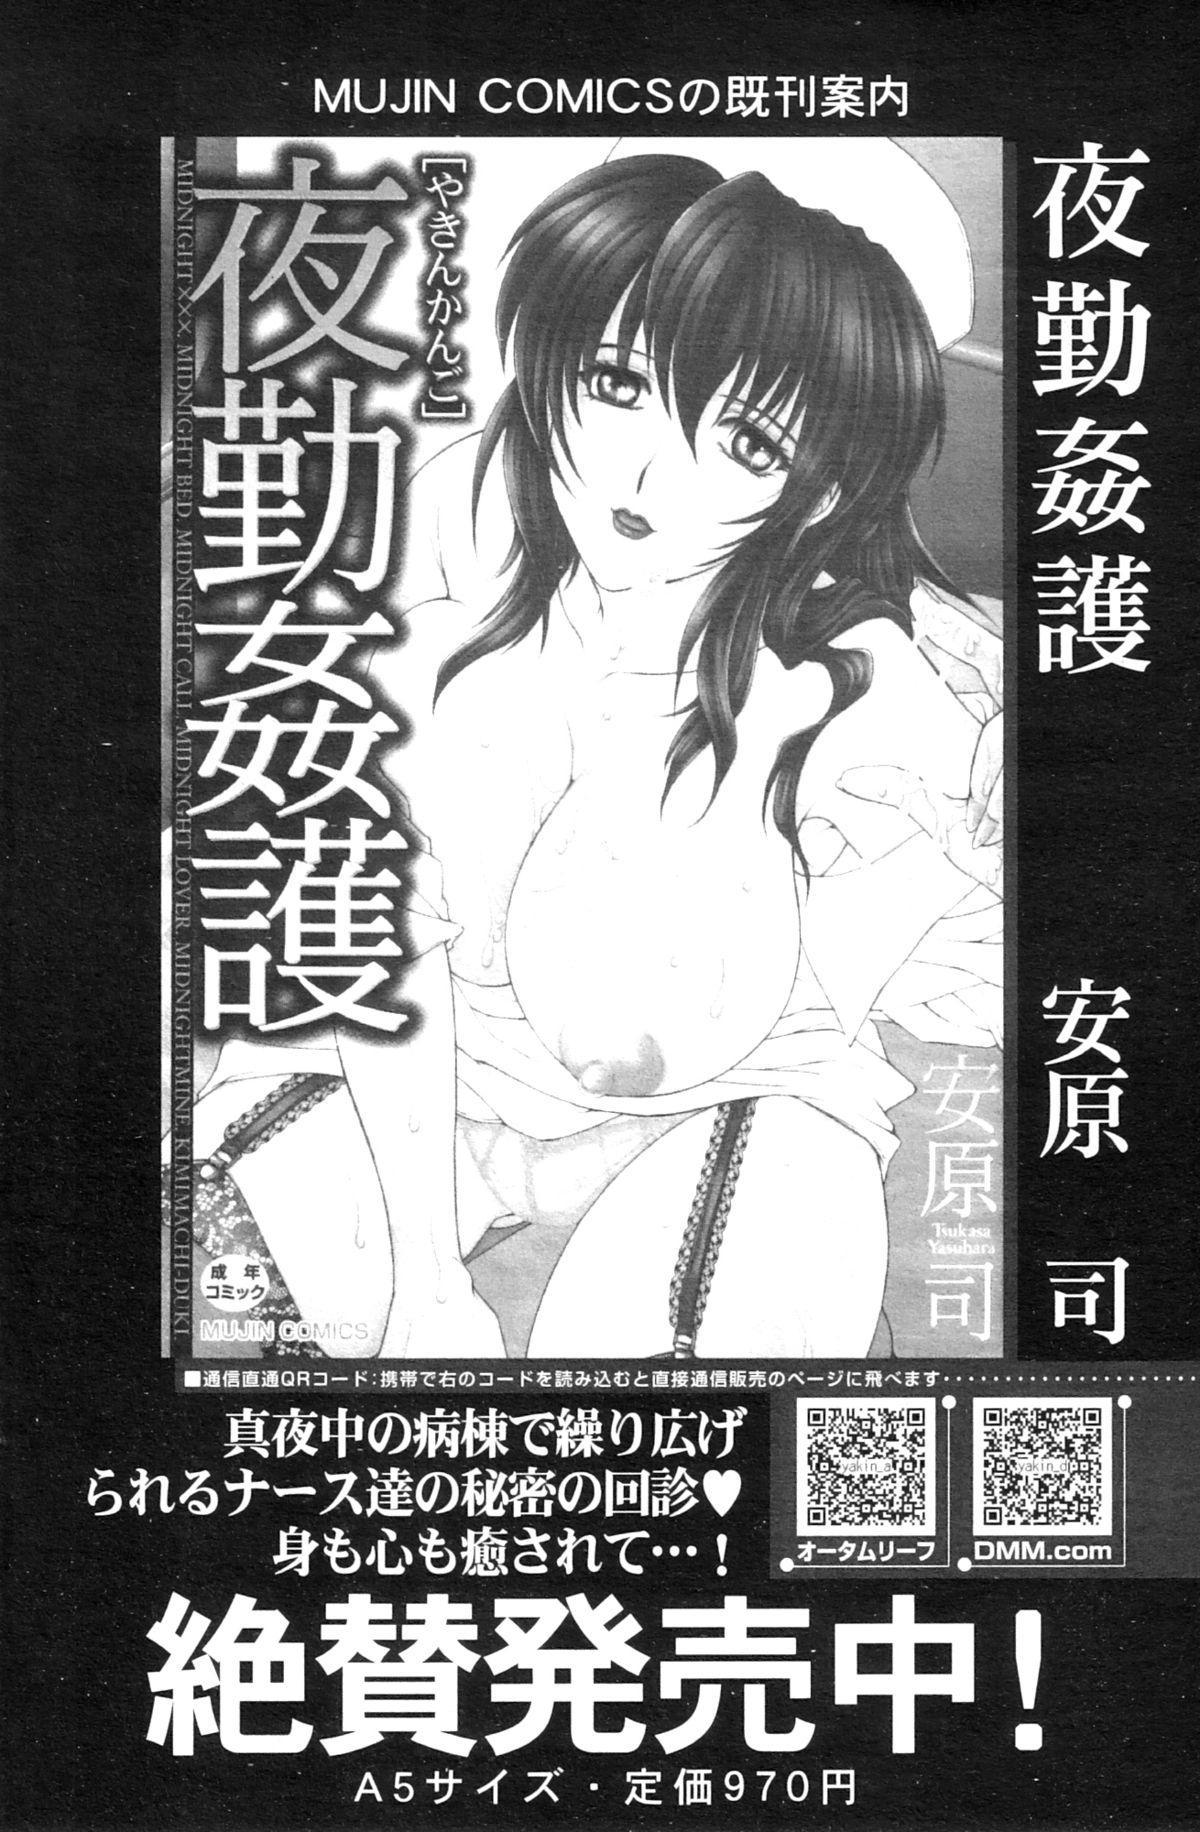 COMIC MILF 2013-02 Vol. 11 173